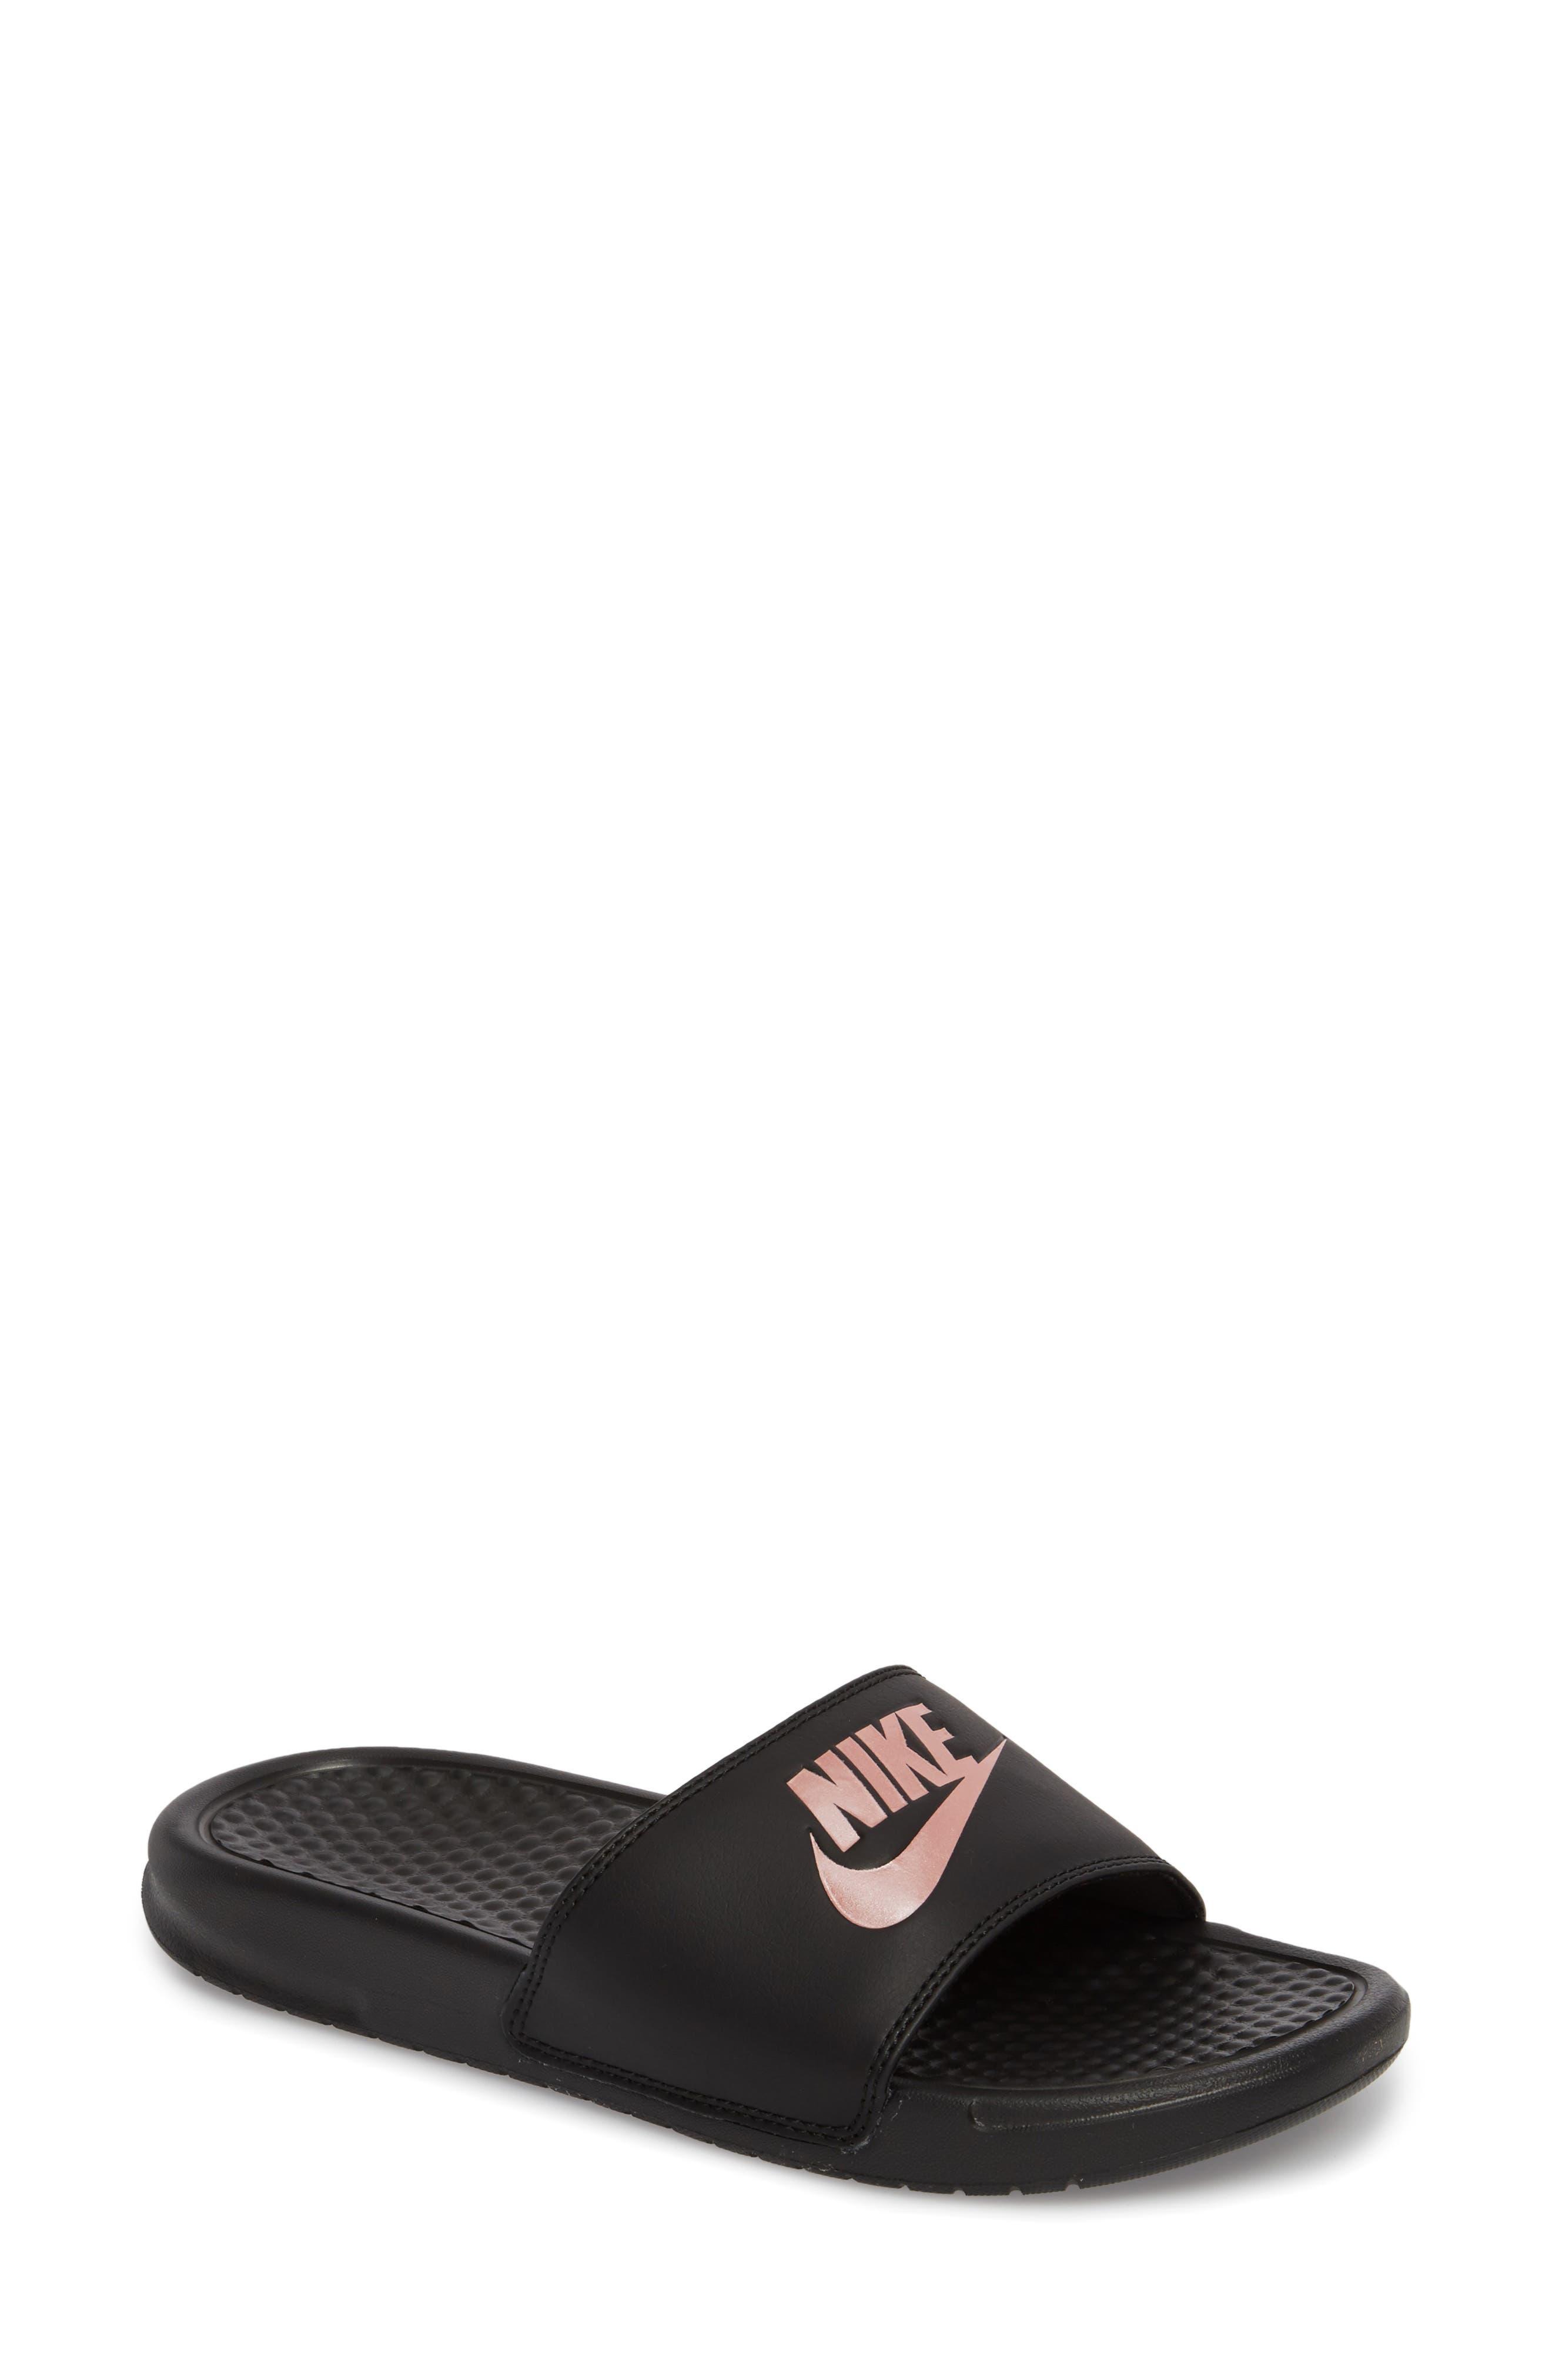 Benassi JDI Slide Sandal,                         Main,                         color, 007